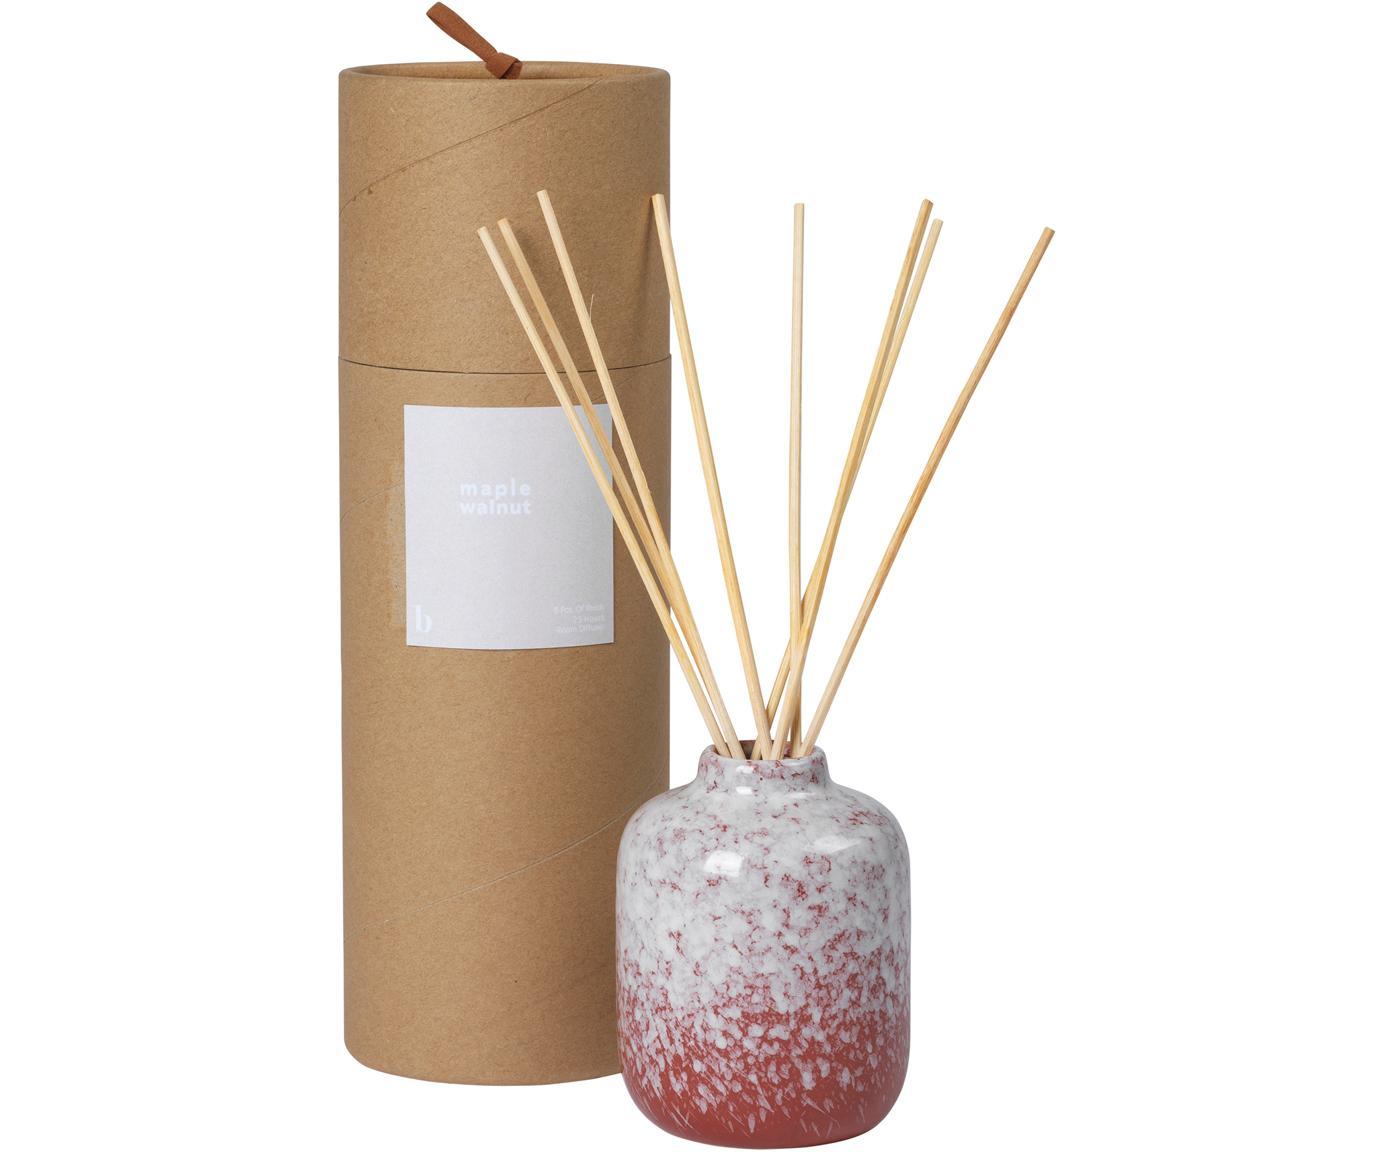 Diffuser Maple Walnut, Behälter: Keramik, Rot, Weiss, Ø 7 x H 9 cm